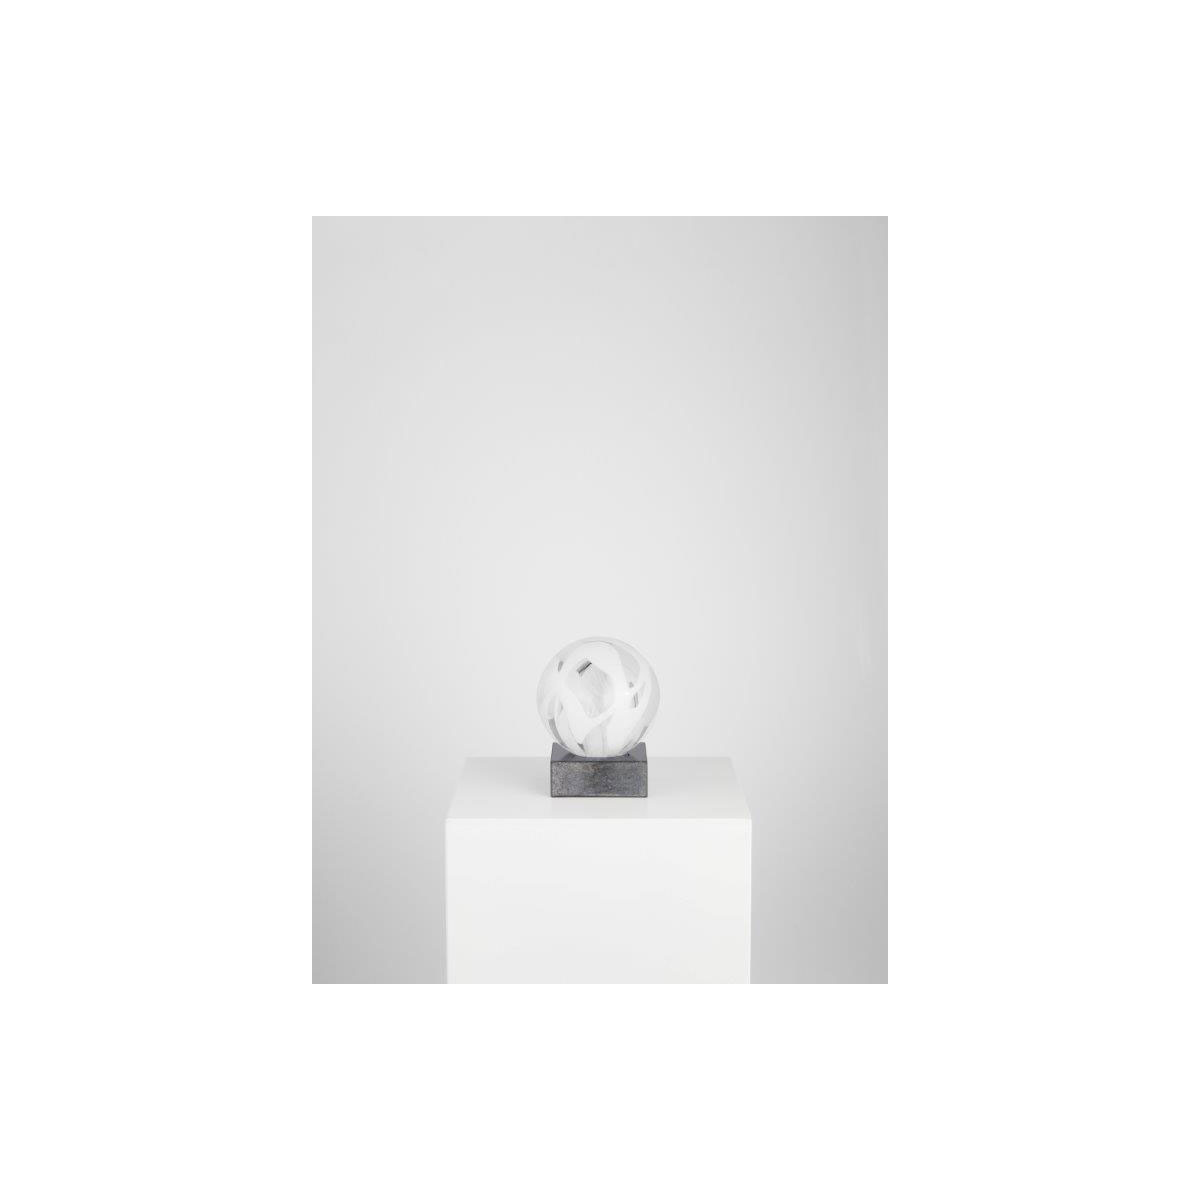 Kosta Boda Art Glass Anna Ehrner White Sphere, Limited Edition of 30